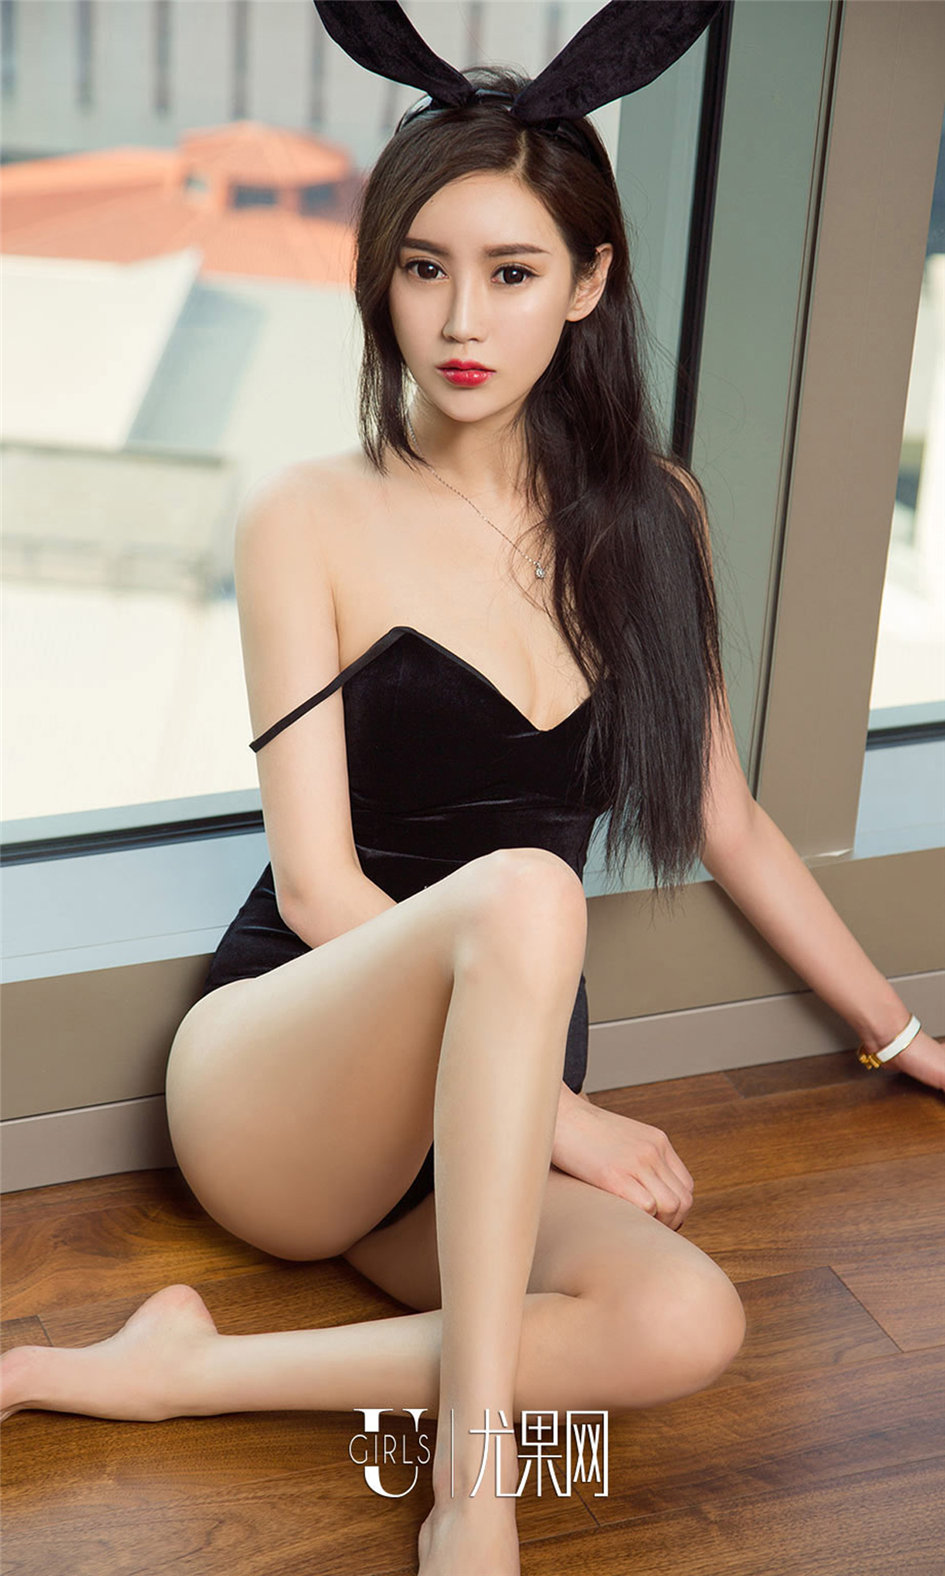 [ugirls尤果网] 气质清纯美女模特安佑娅室内高清写真图